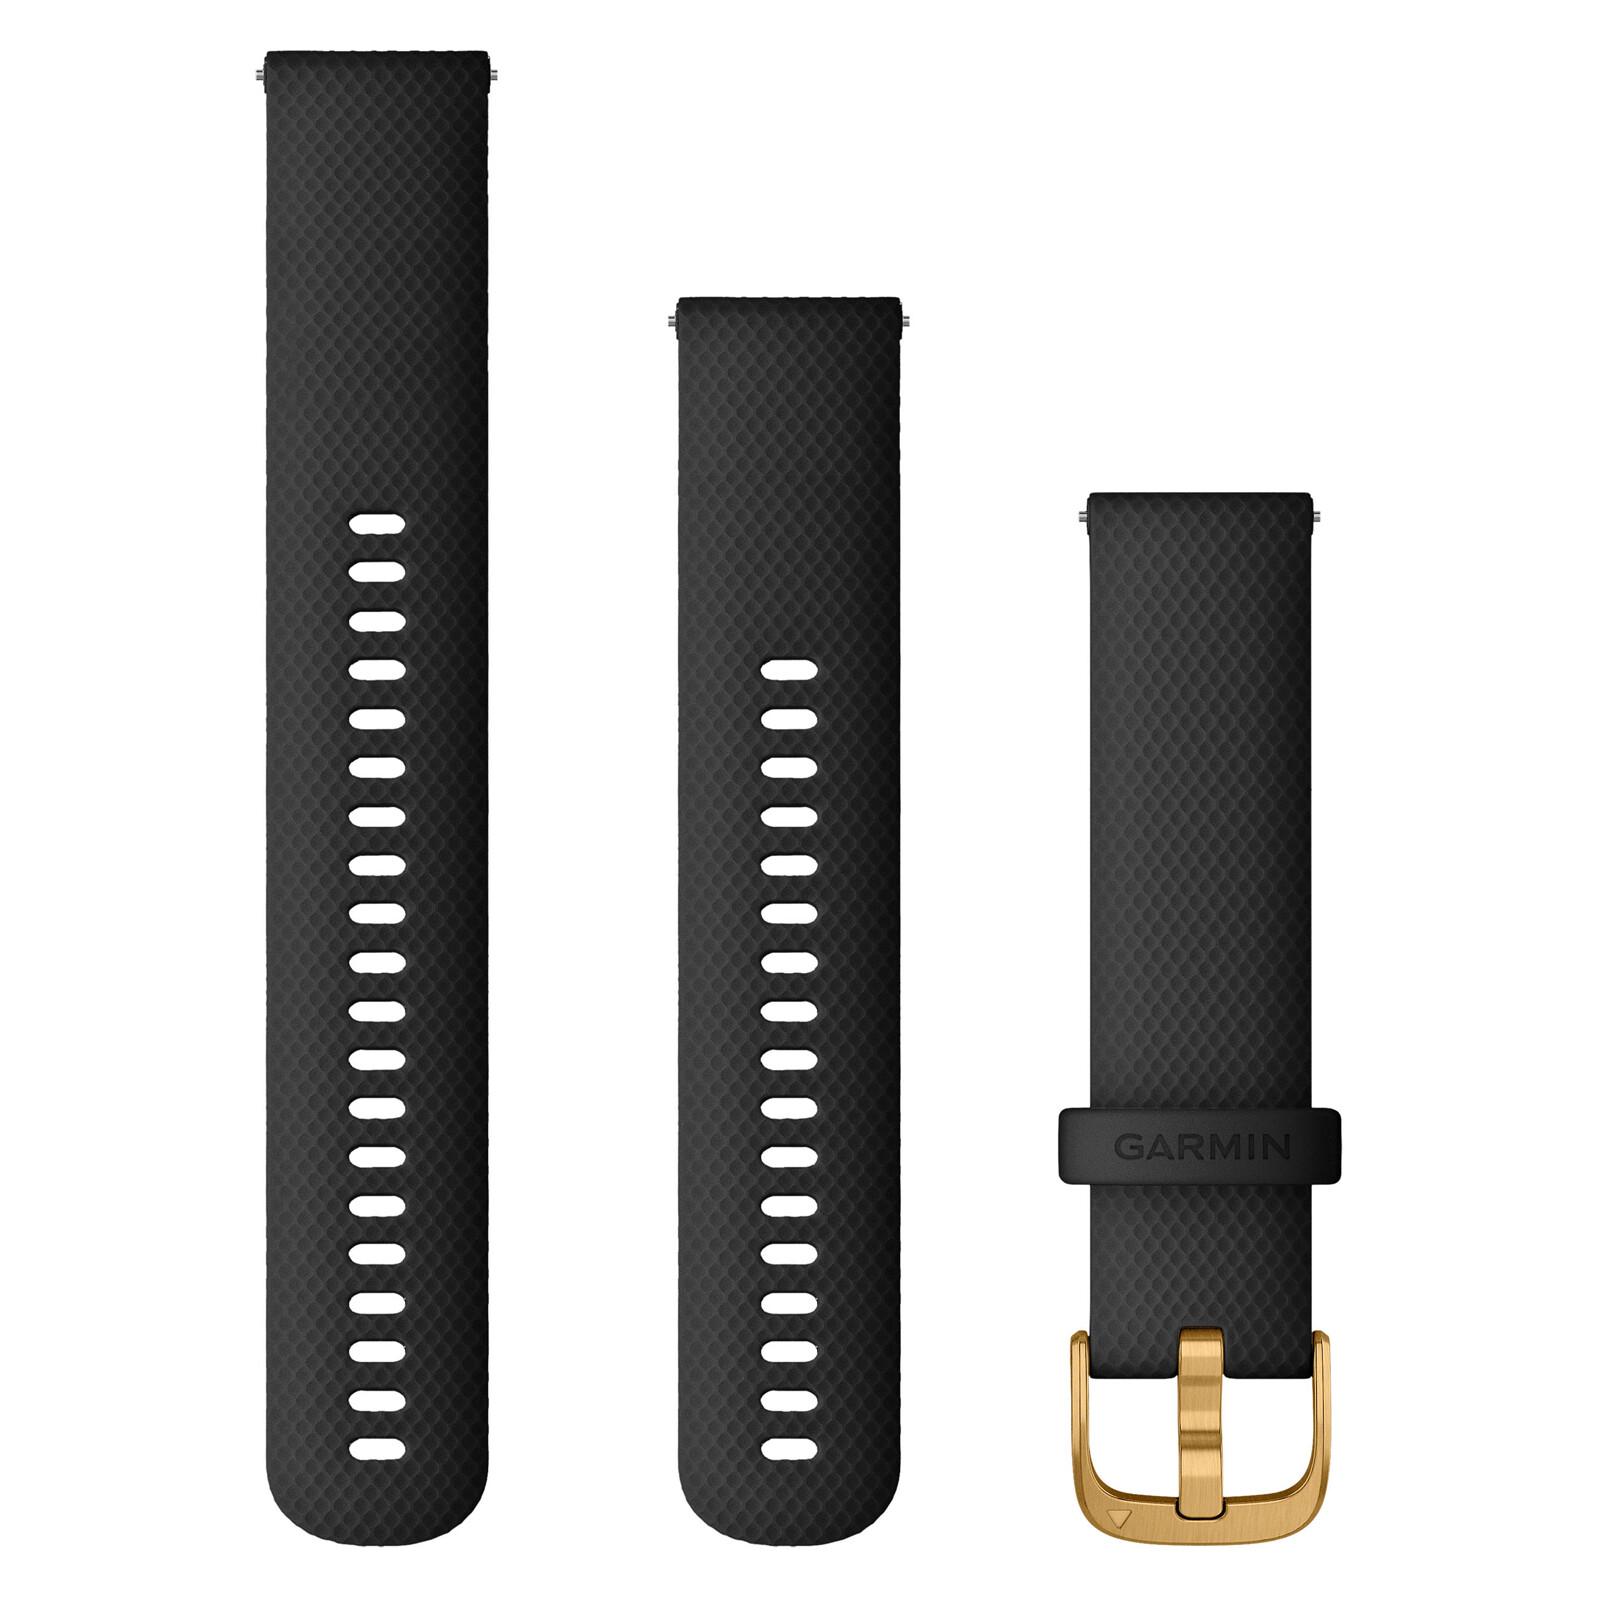 Garmin Uhrenarmband Venu 20mm Silikon schwarz